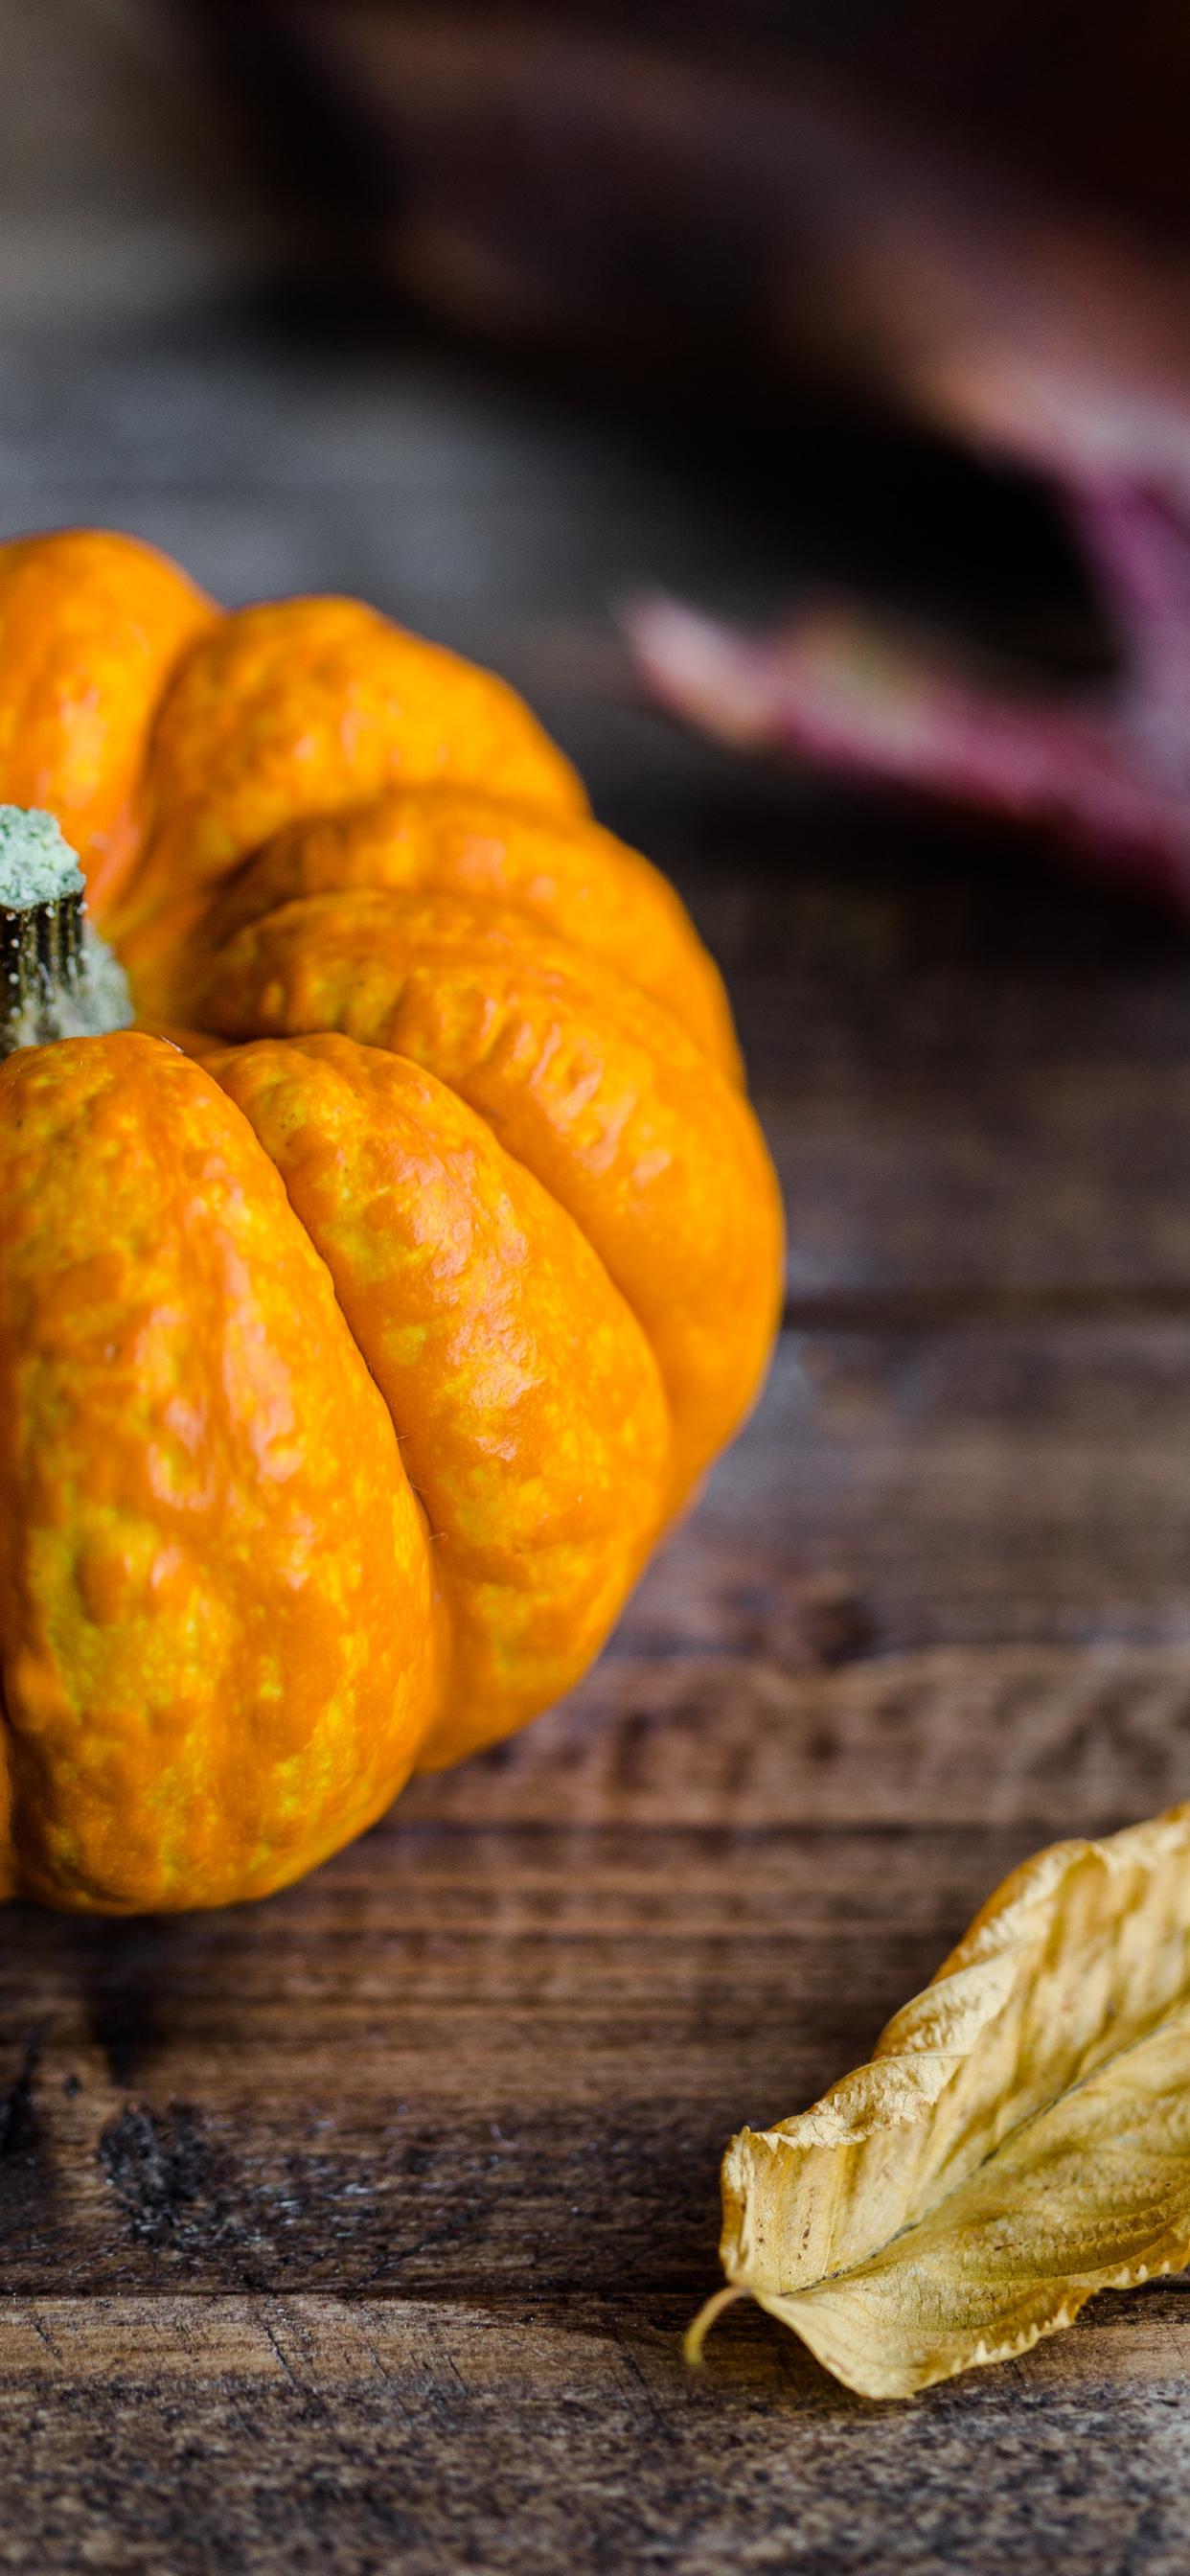 Pumpkin bokeh effect